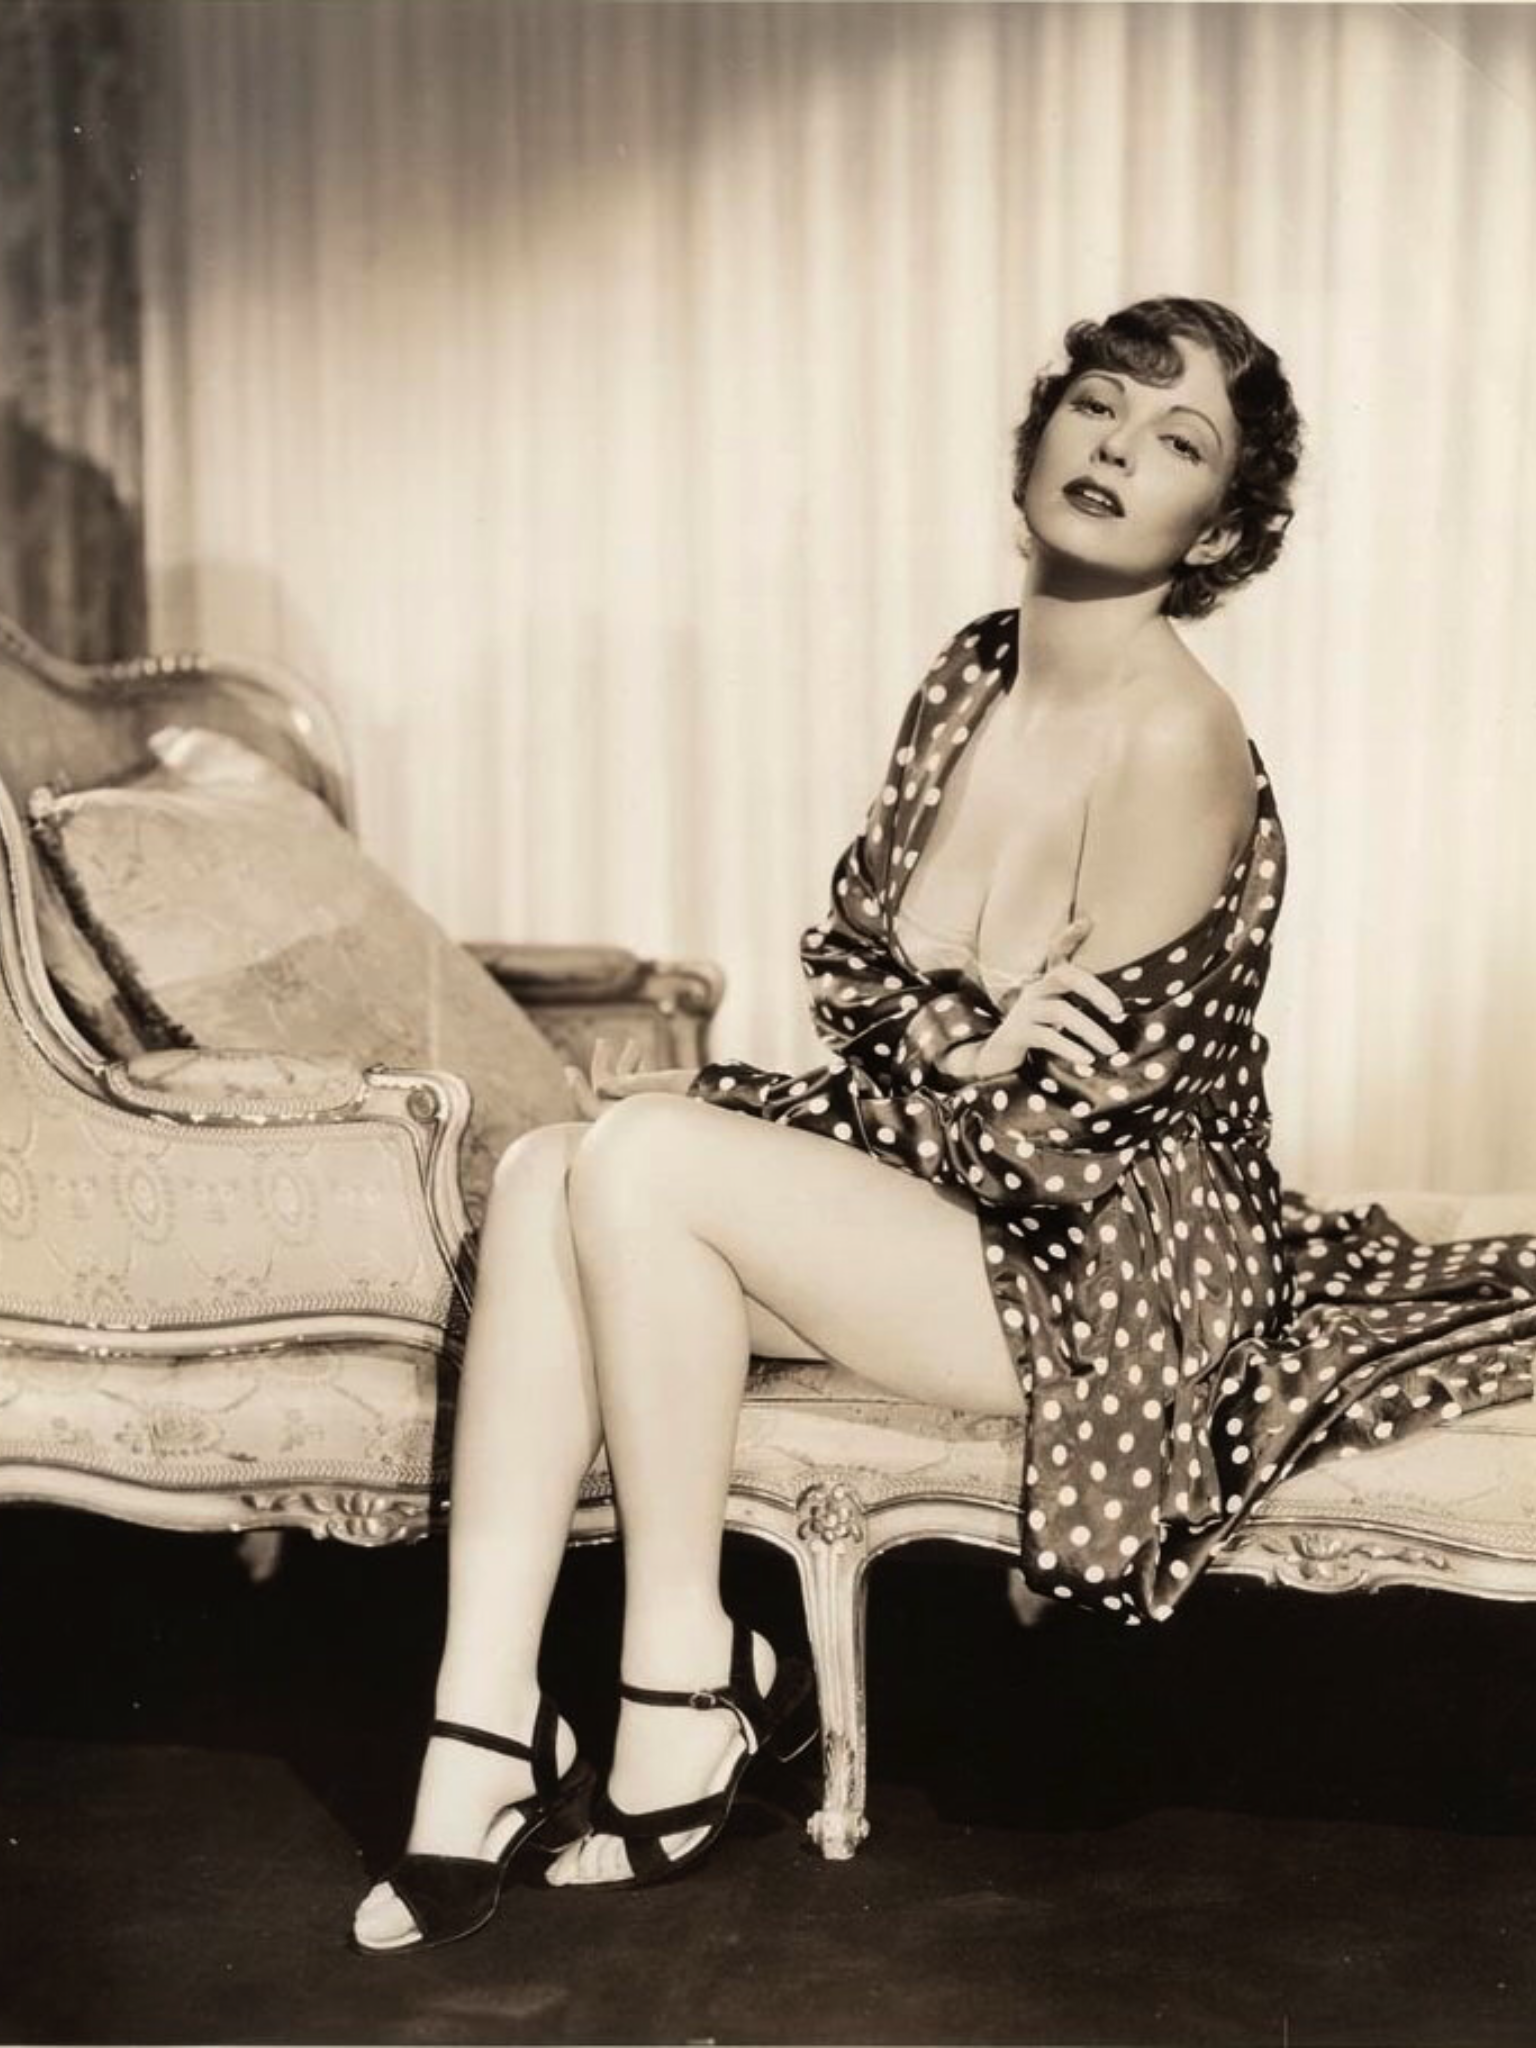 Marguerite Churchill nude photos 2019